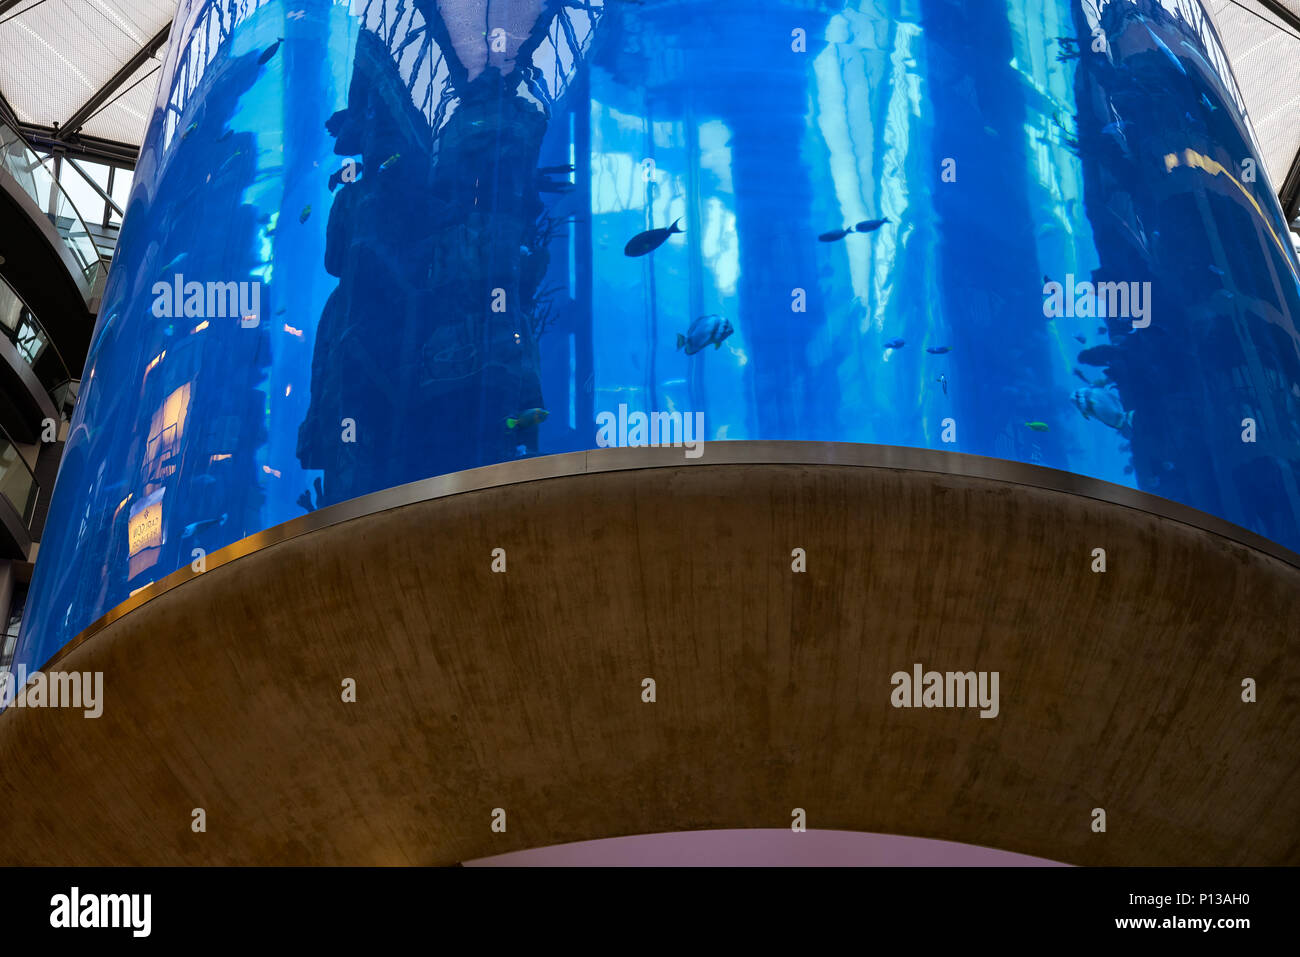 Berlin, Germany - April 5, 2017: Aquarium inside Radisson Hotel Sea Life in Berlin - Stock Image